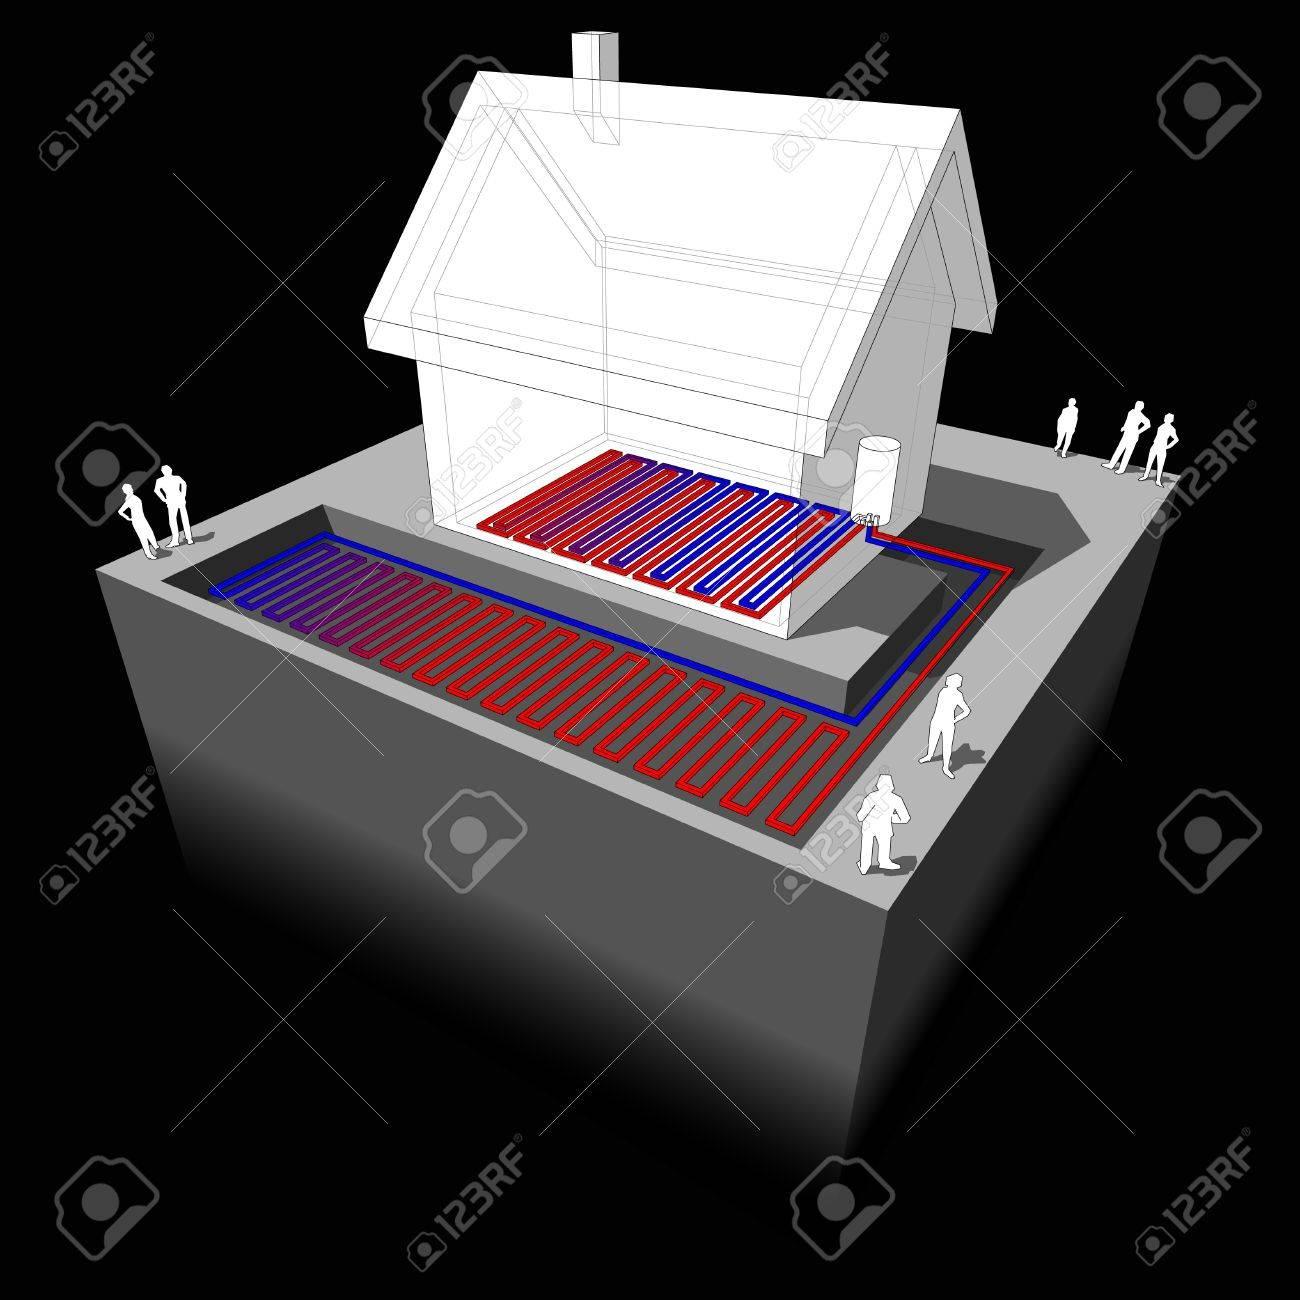 heat pump/underfloorheating diagram Stock Vector - 10333944